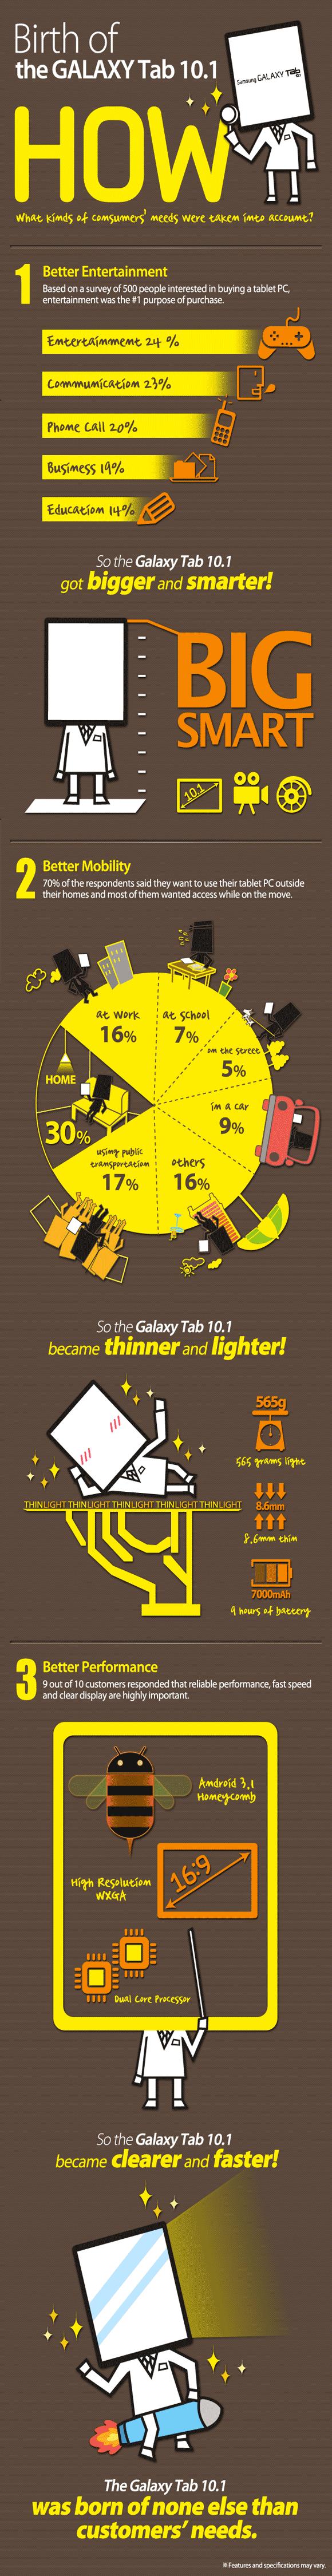 GALAXY Tab 10 Infographic The Birth of Samsung Galaxy Tab 10.1 [Infographic]